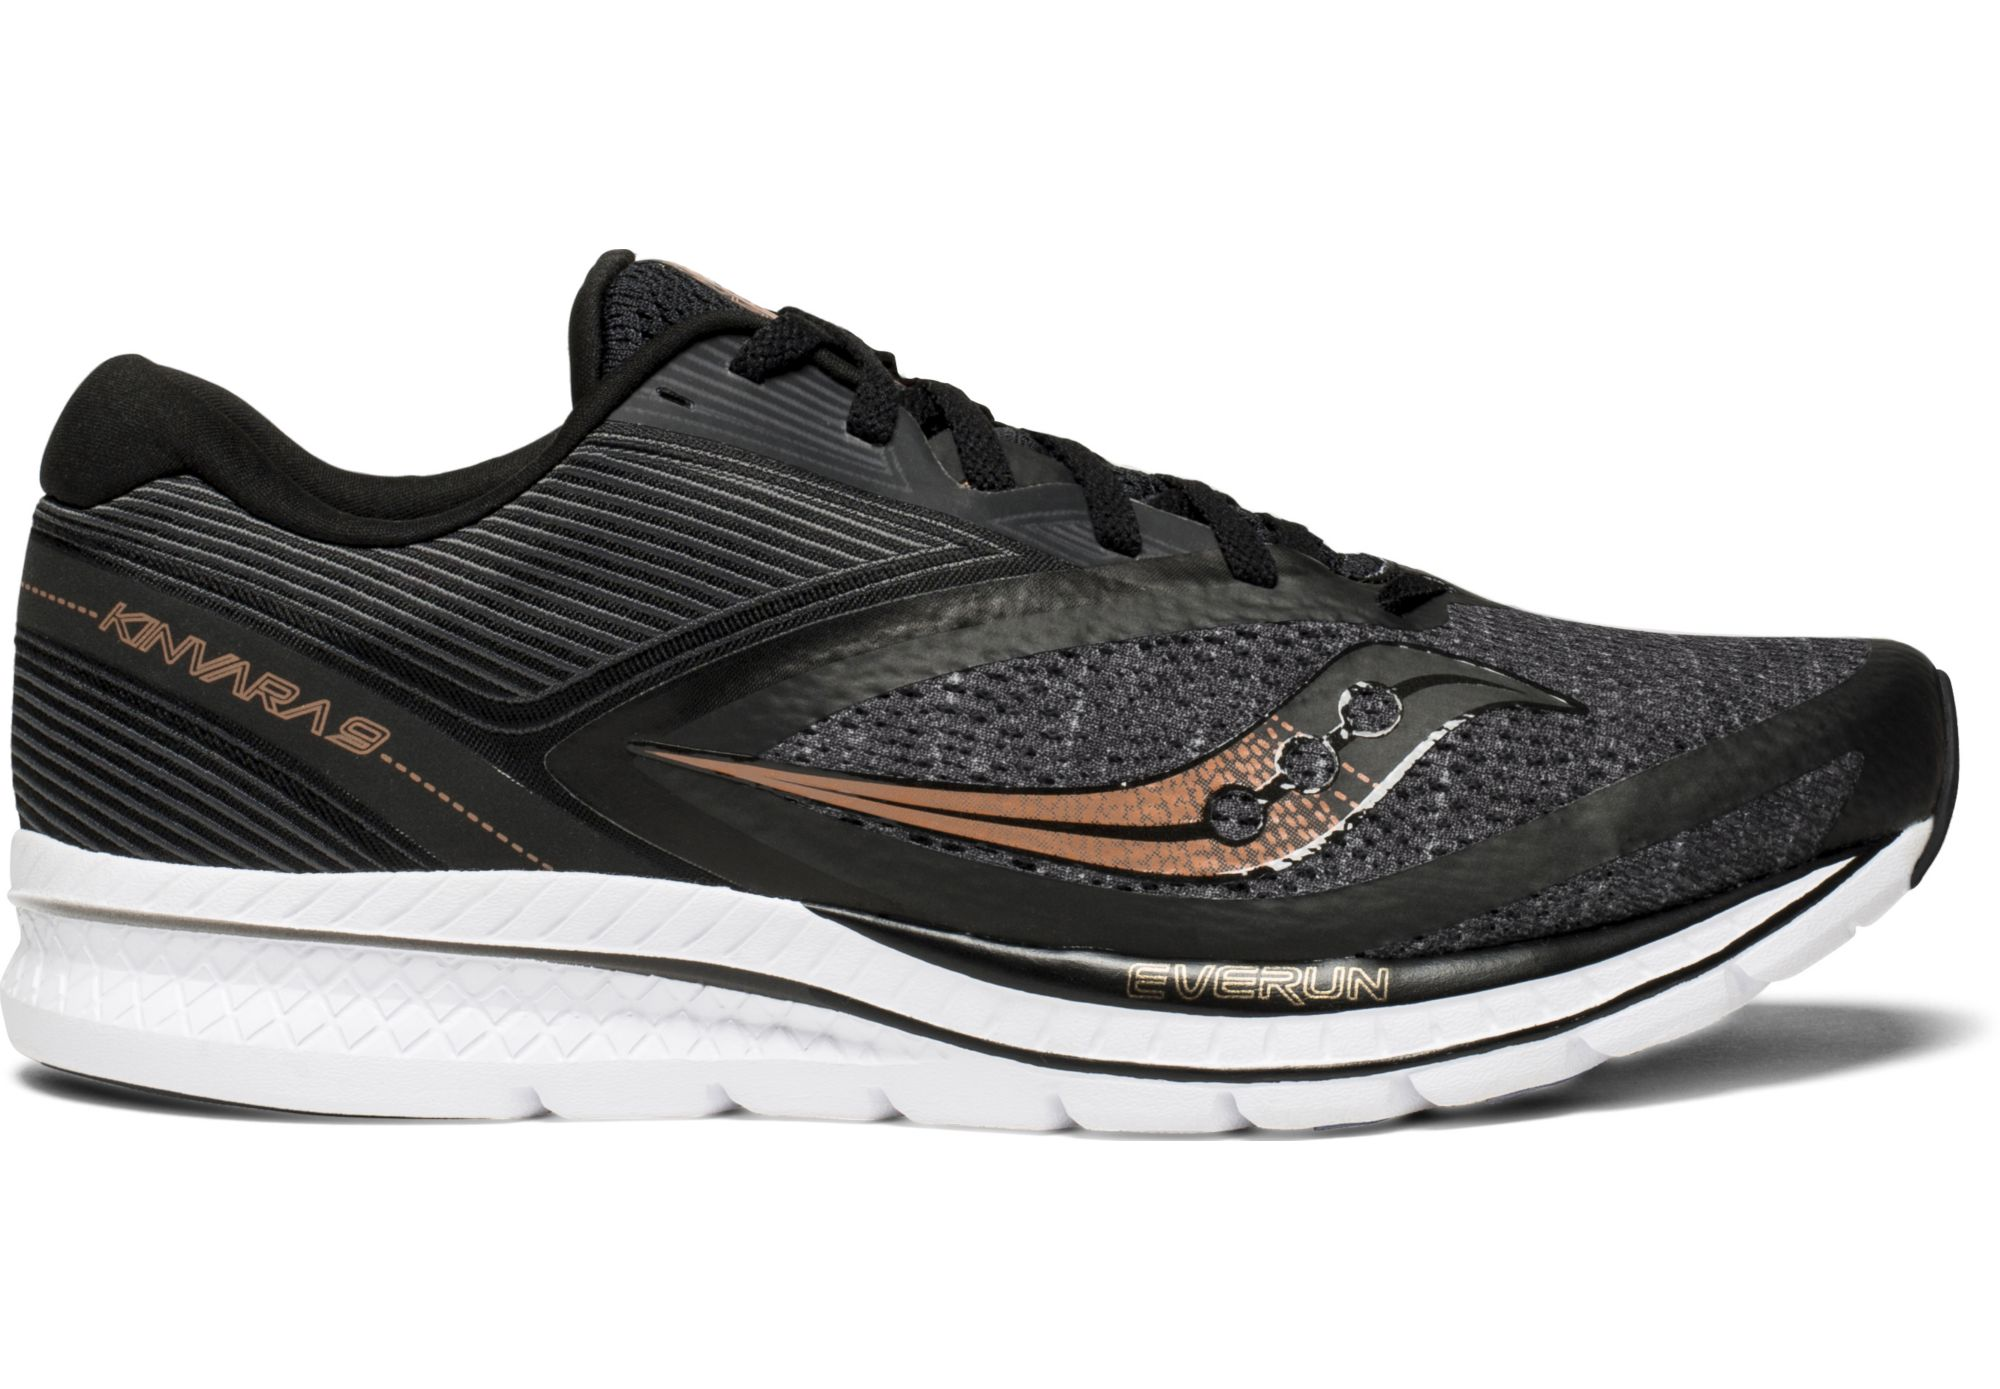 968474f4 SAUCONY Kinvara 9 Running Shoes Black/Grey